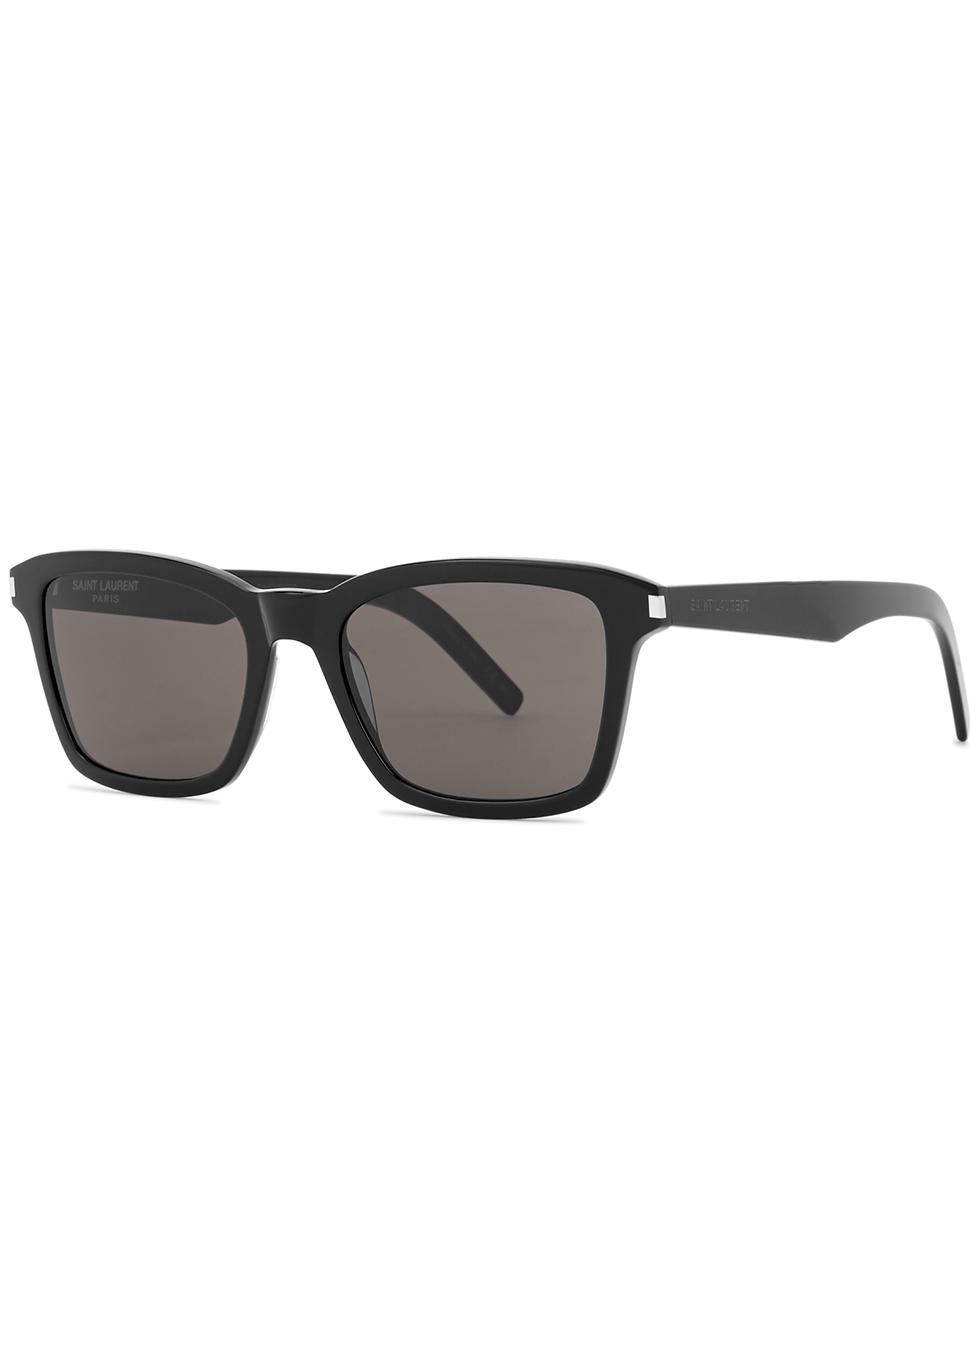 SL283 square-frame sunglasses - Saint Laurent